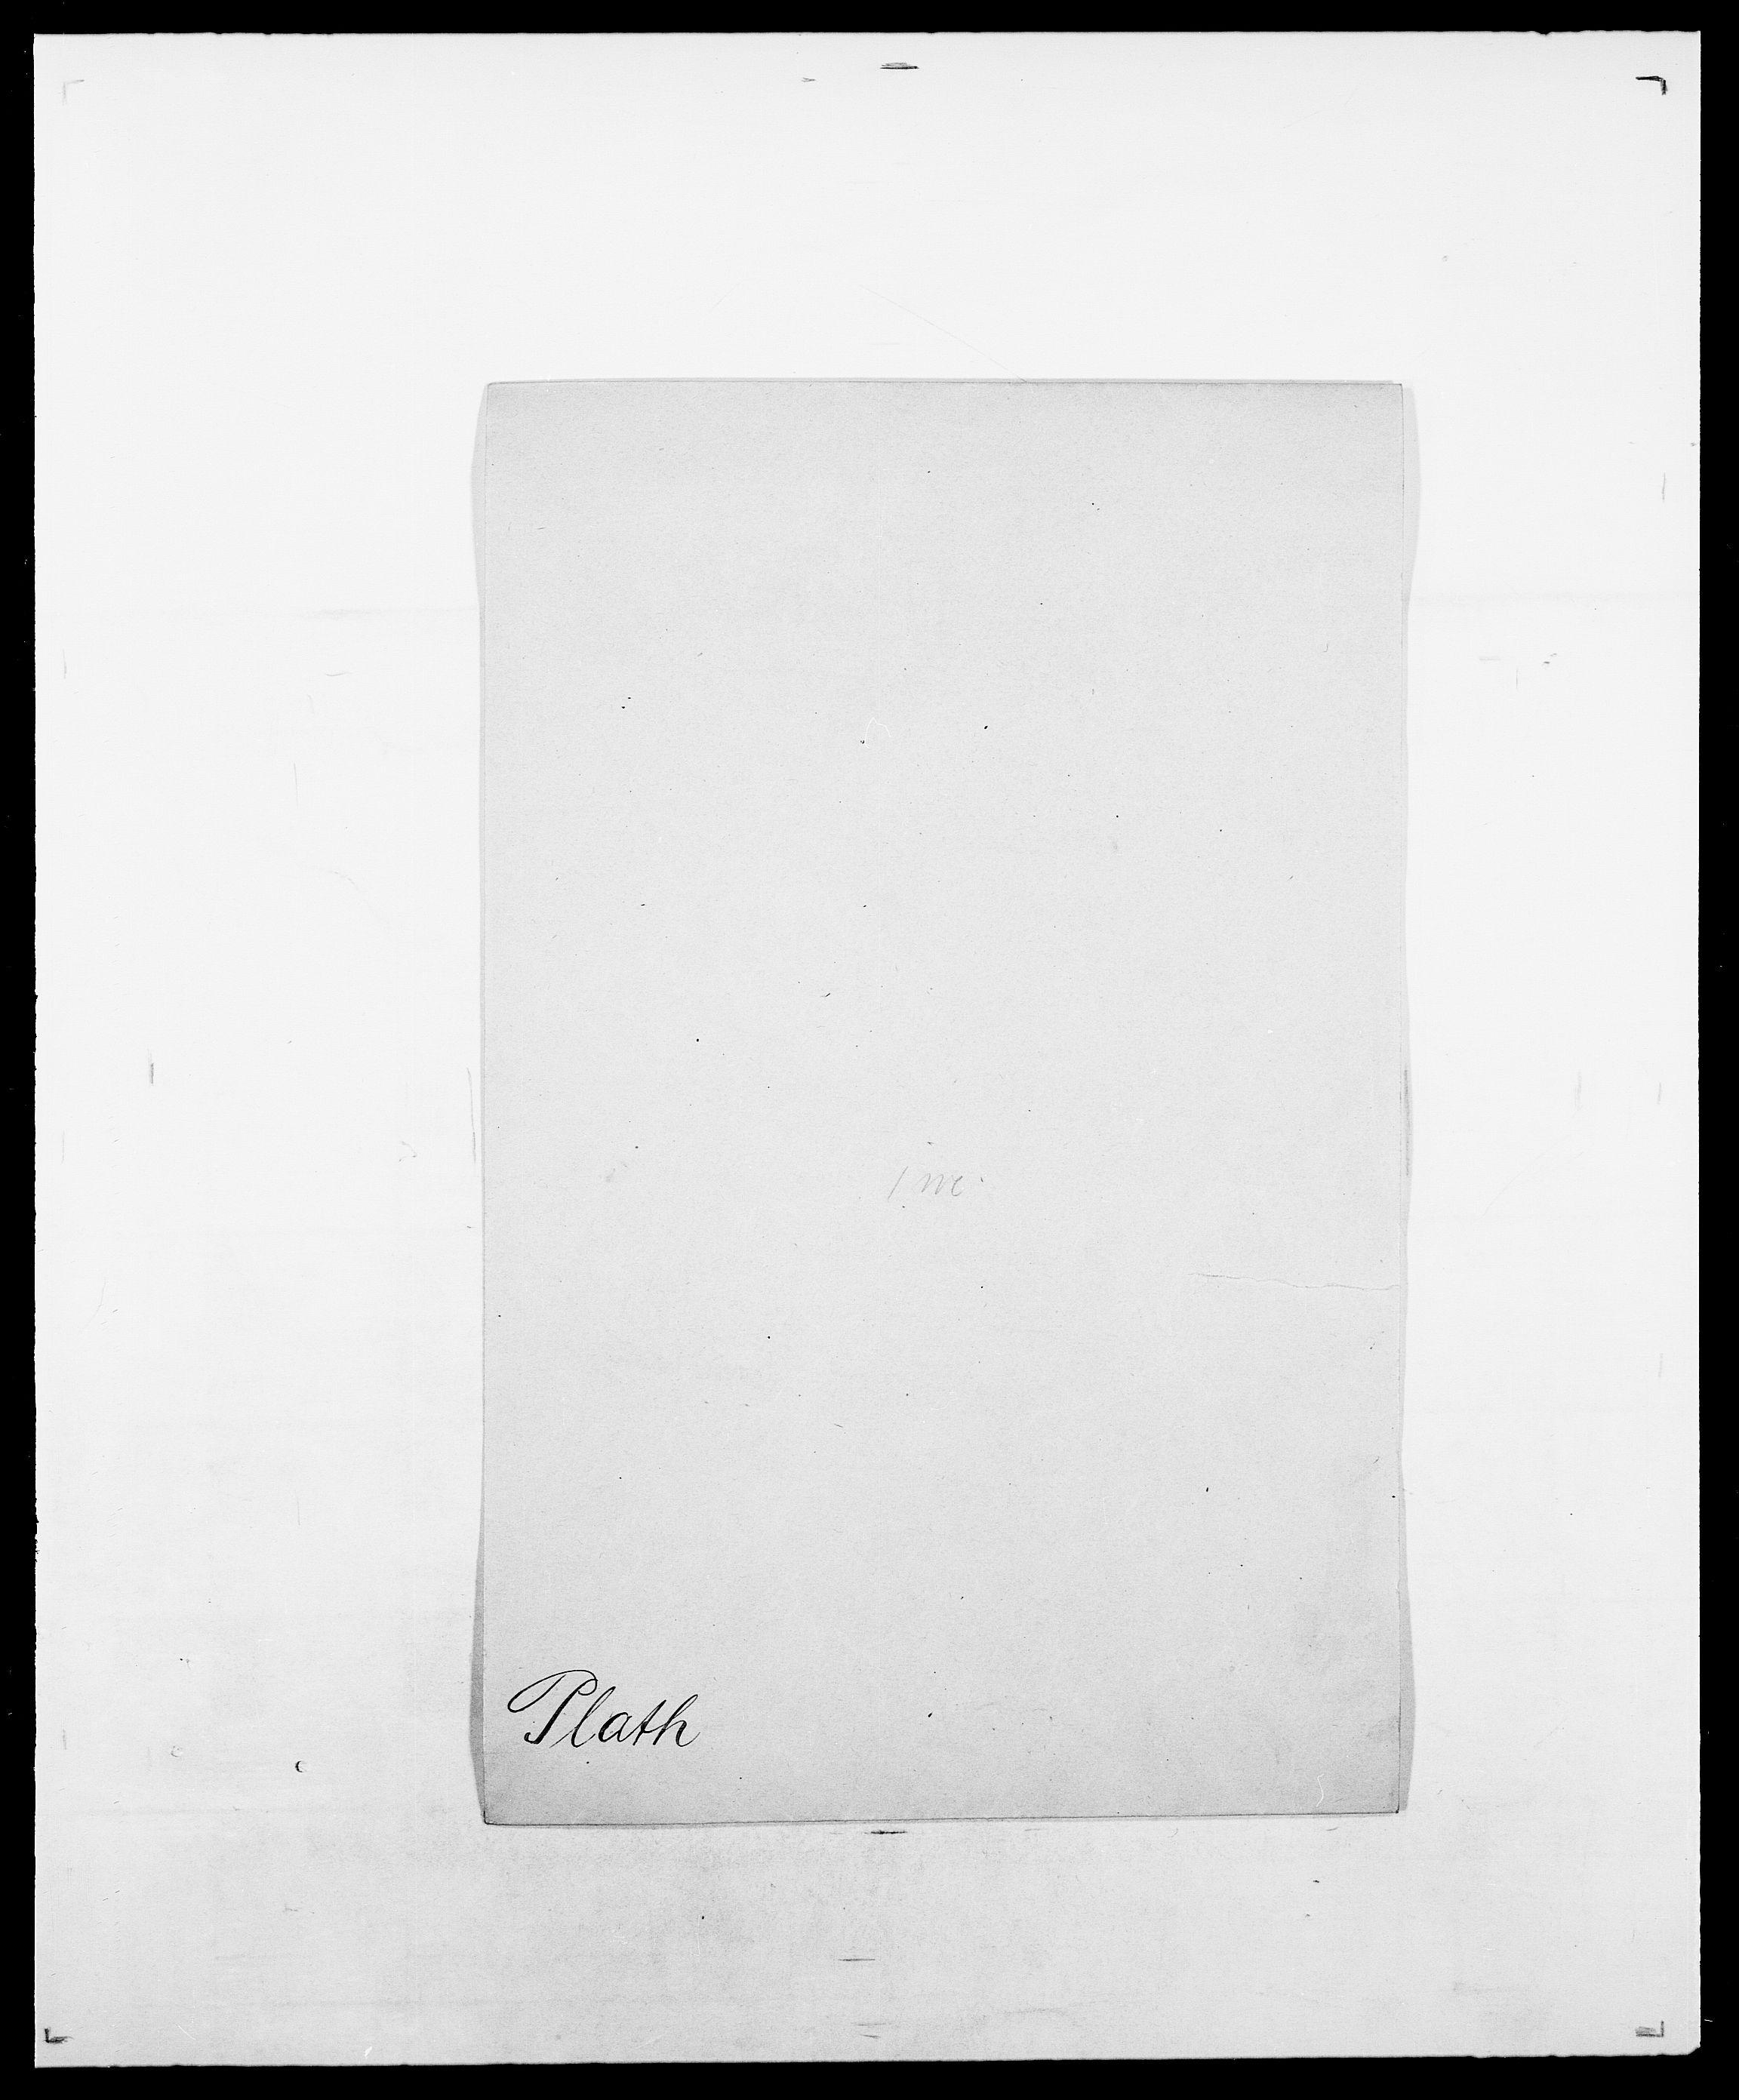 SAO, Delgobe, Charles Antoine - samling, D/Da/L0031: de Place - Raaum, s. 35